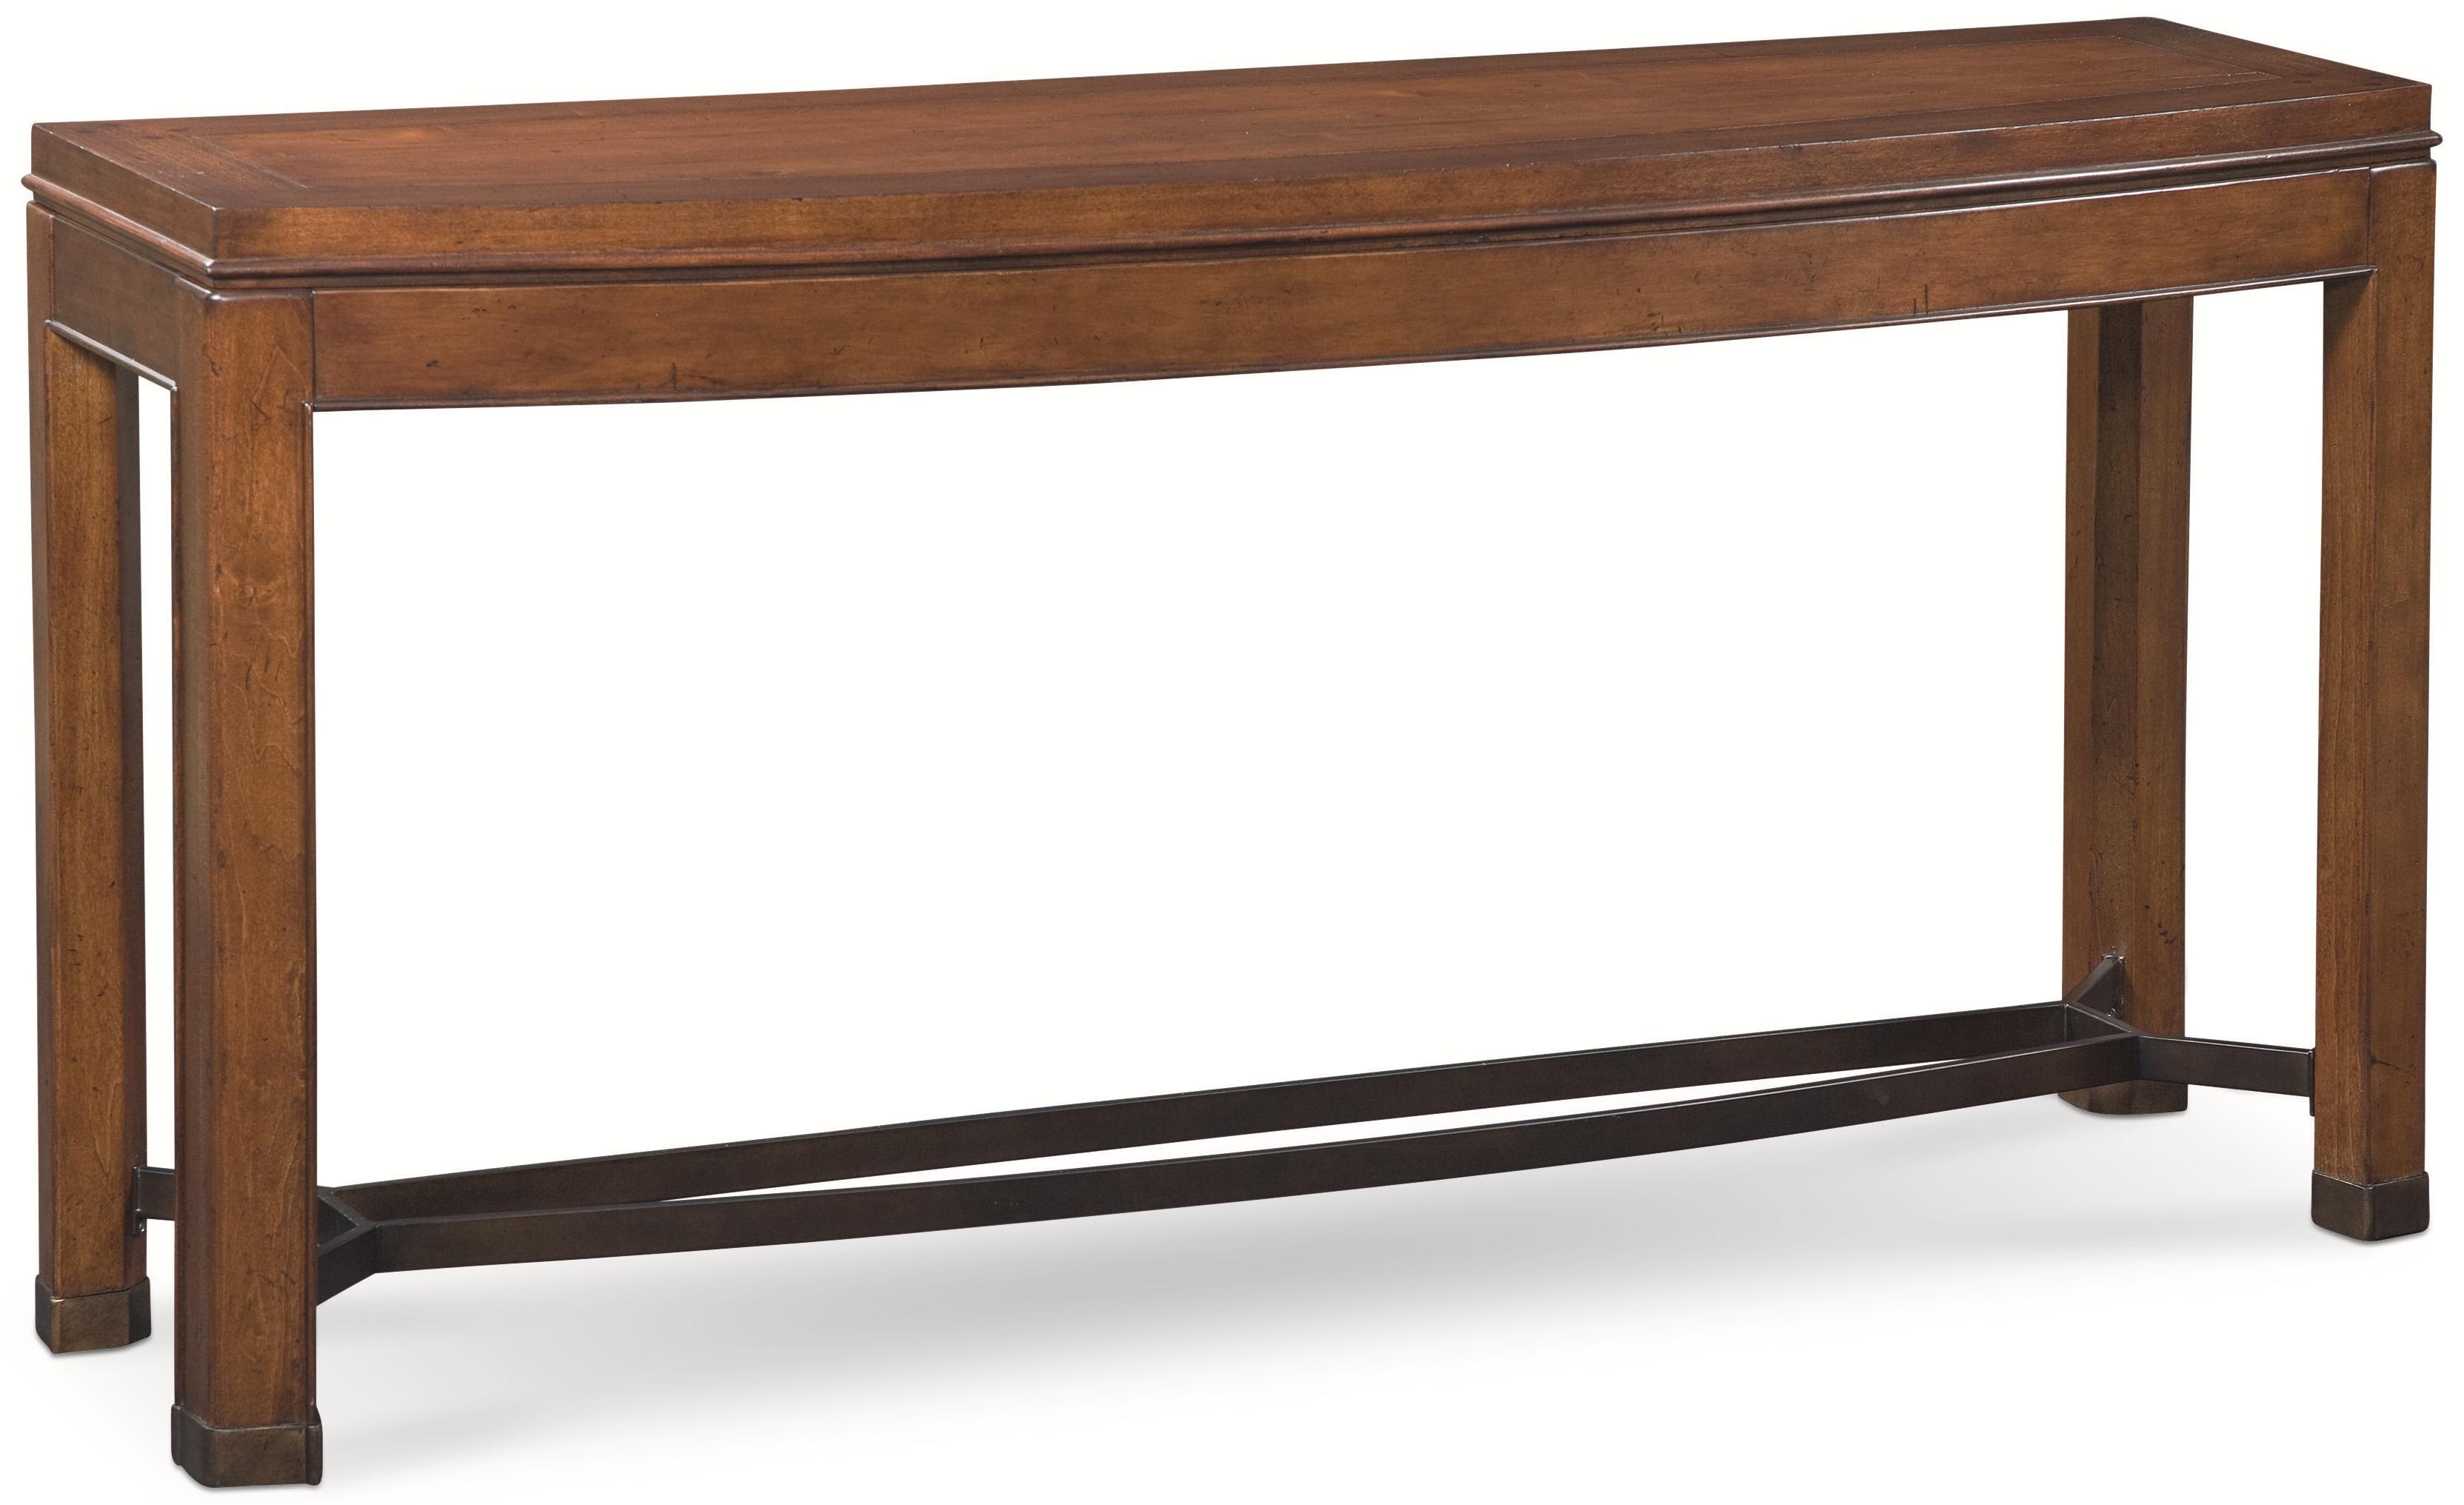 Thomasville® American Anthem Sofa Table - Item Number: 82831-720